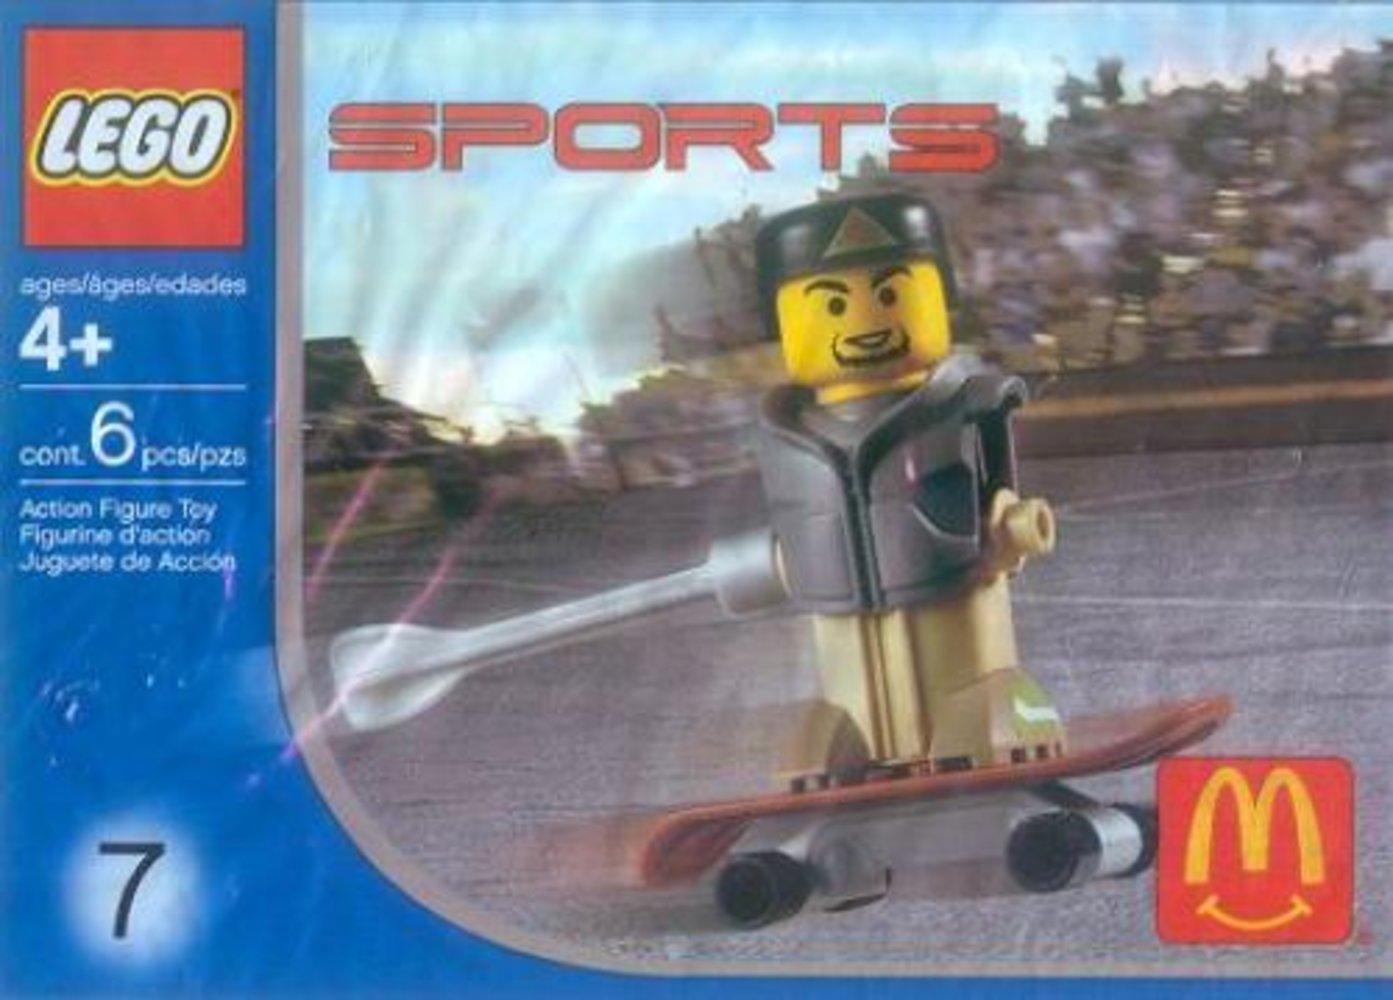 McDonald's Sports Set Number 7 - Gray Vest Skateboarder